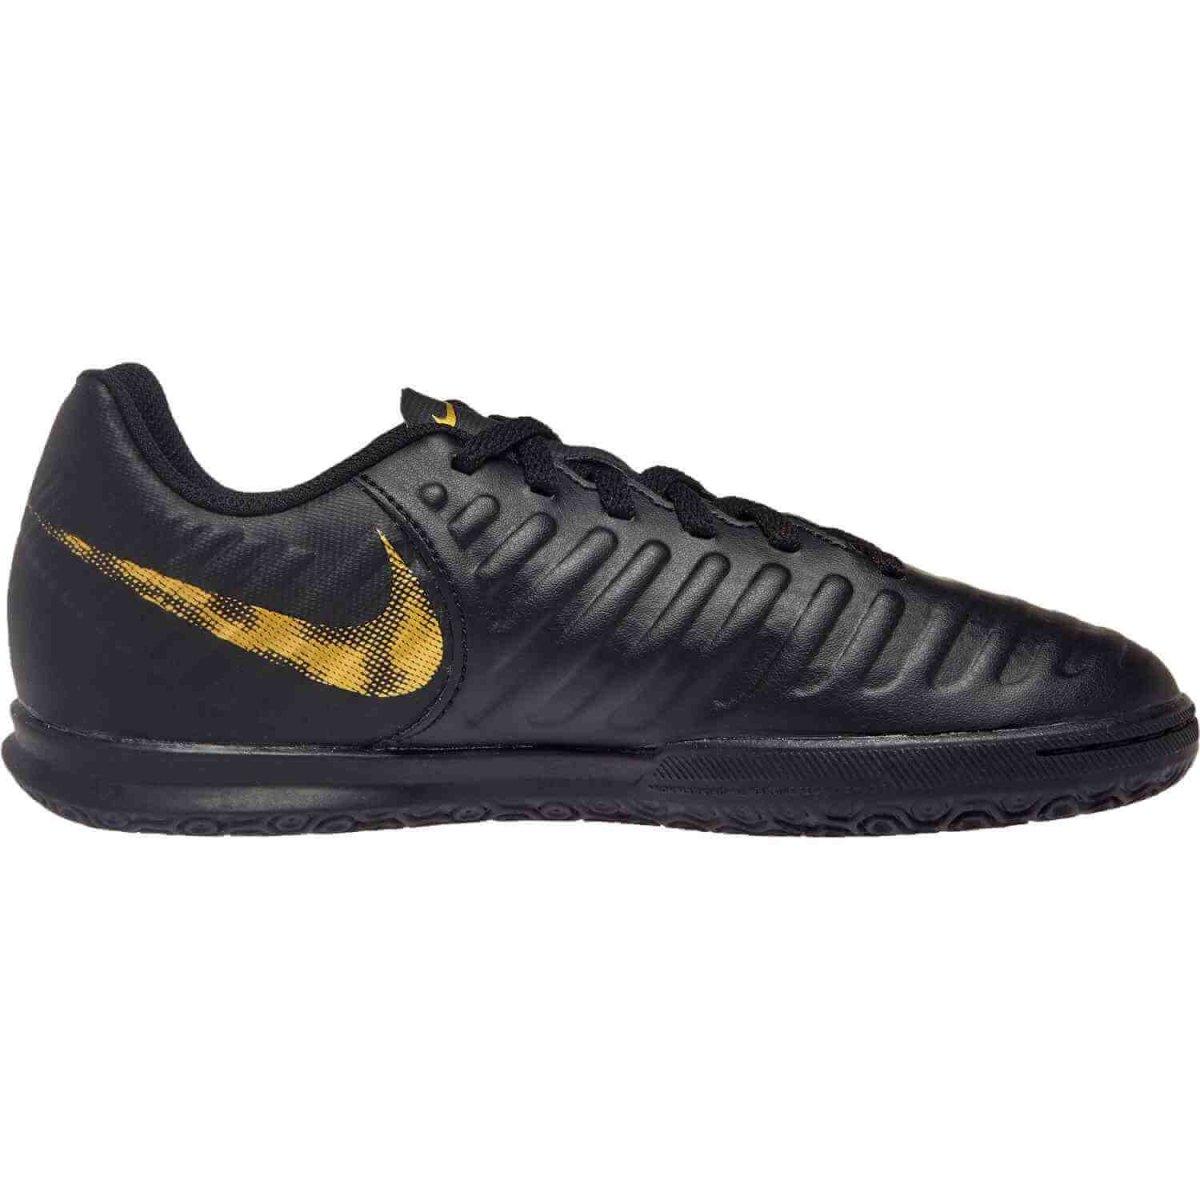 ba62a0da762 Bizz Store - Chuteira Infantil Futsal Nike Legend 7 Club JR